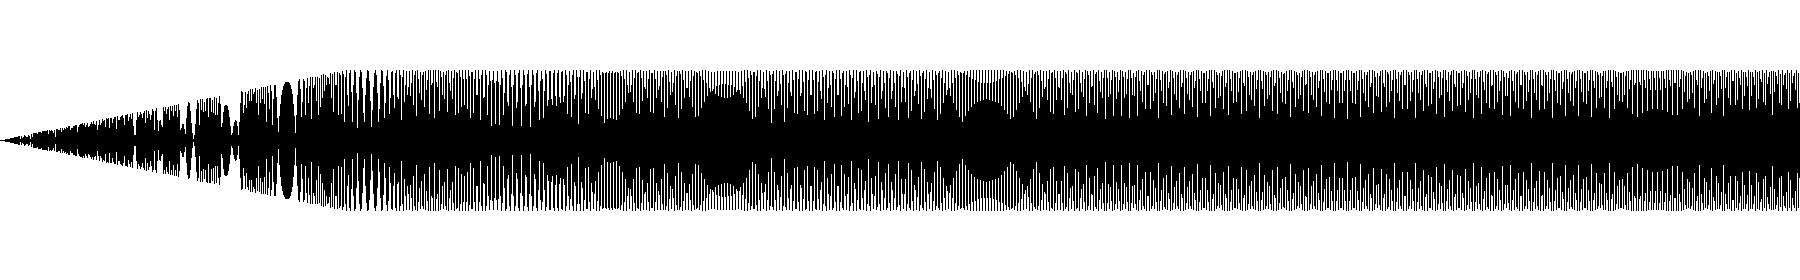 biab glitchhop blip 14